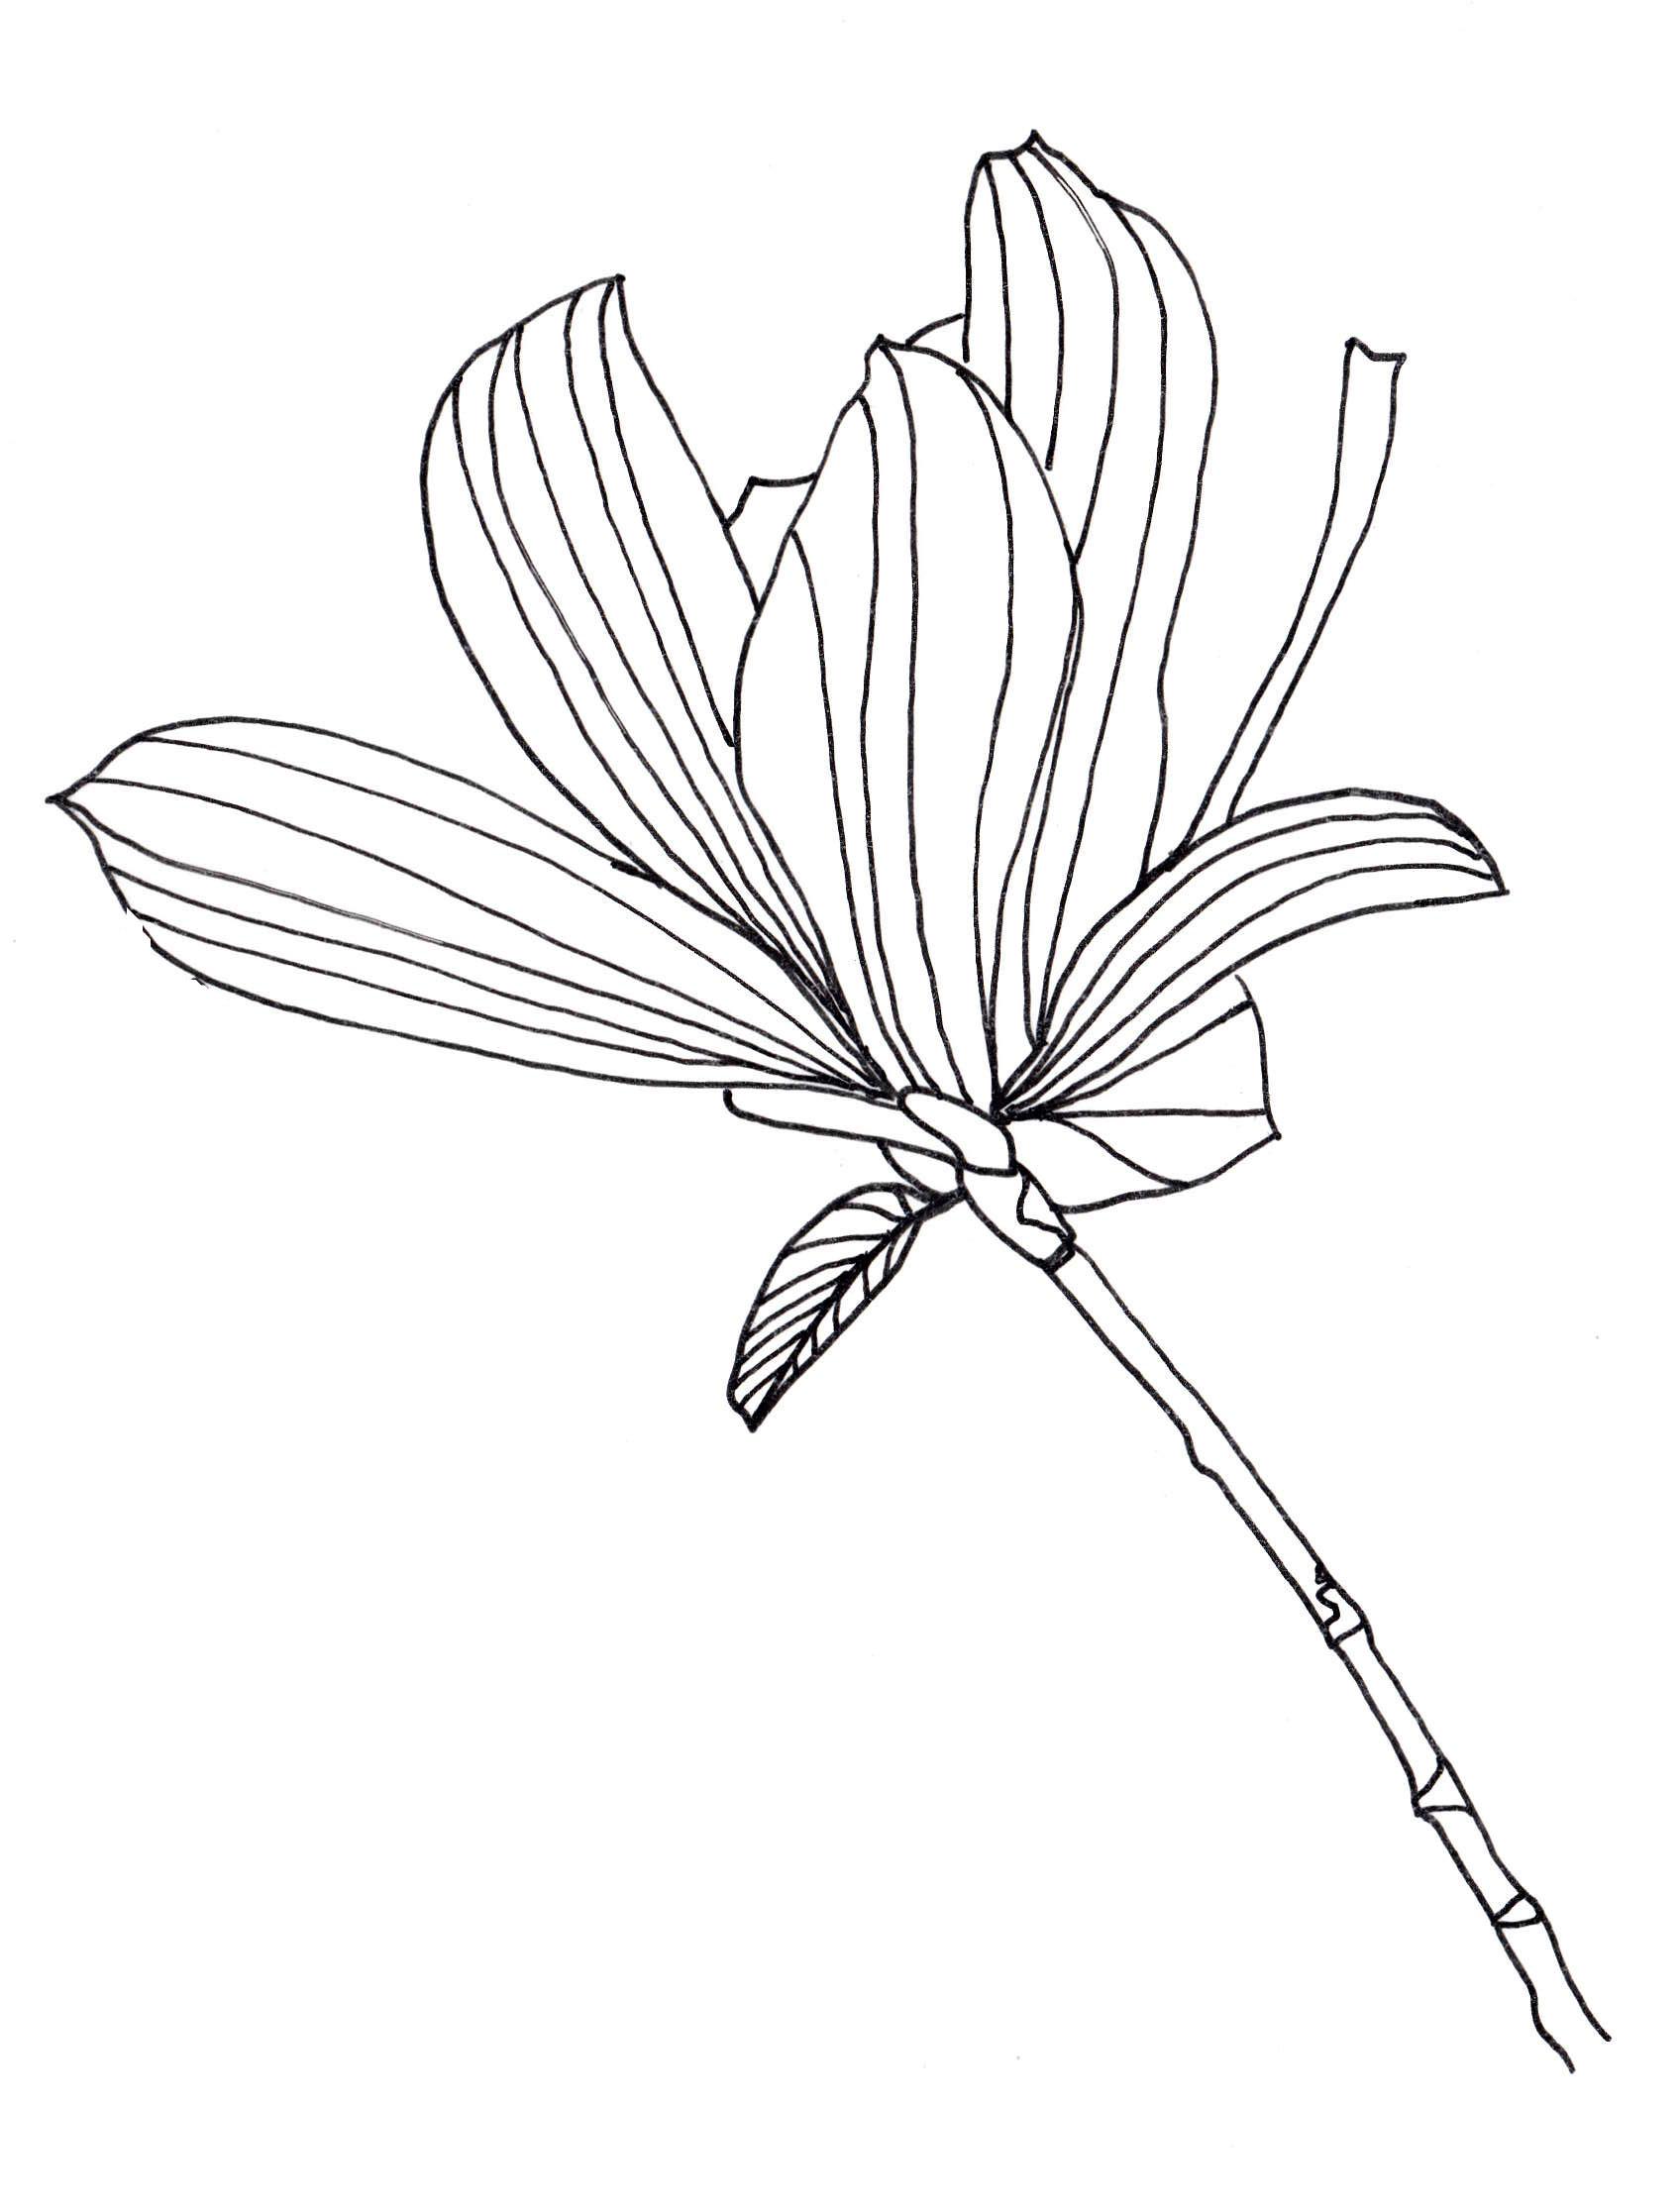 1696x2232 Drawn Tulip Leave Flower